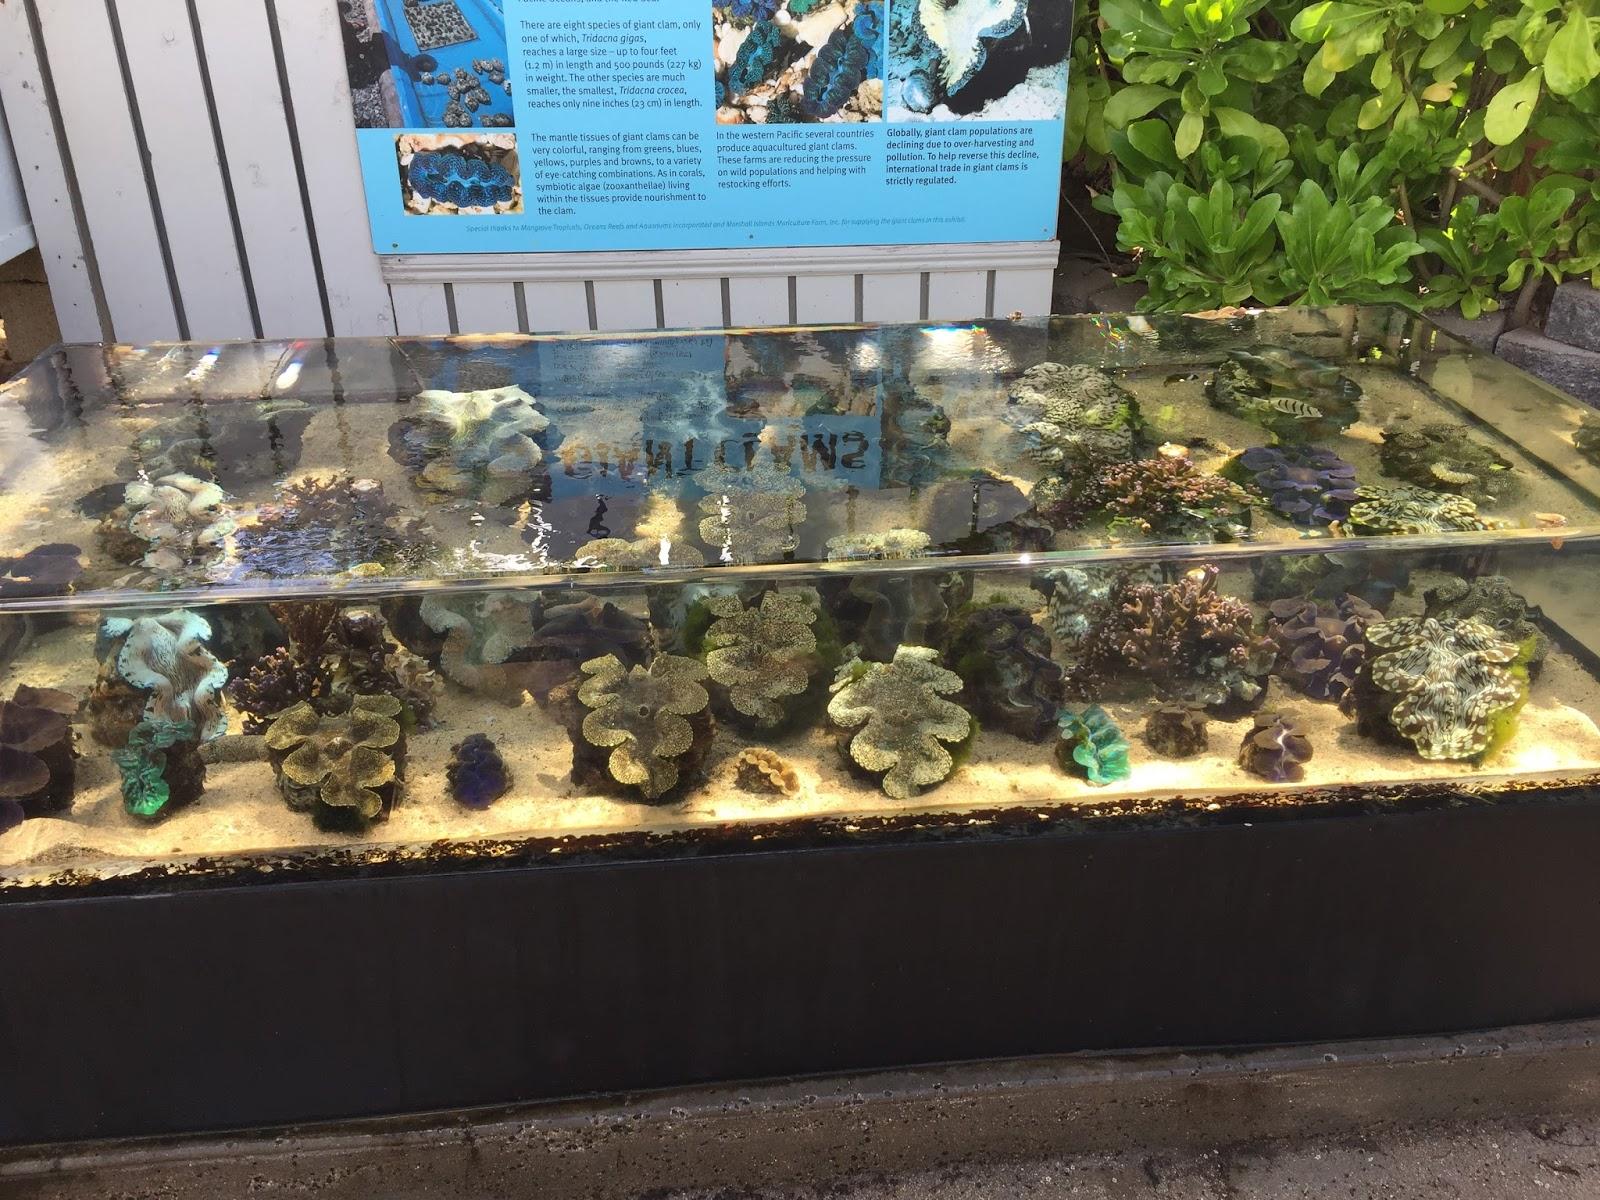 The Life Amphibious Earth Day 2017 At The Waikiki Aquarium